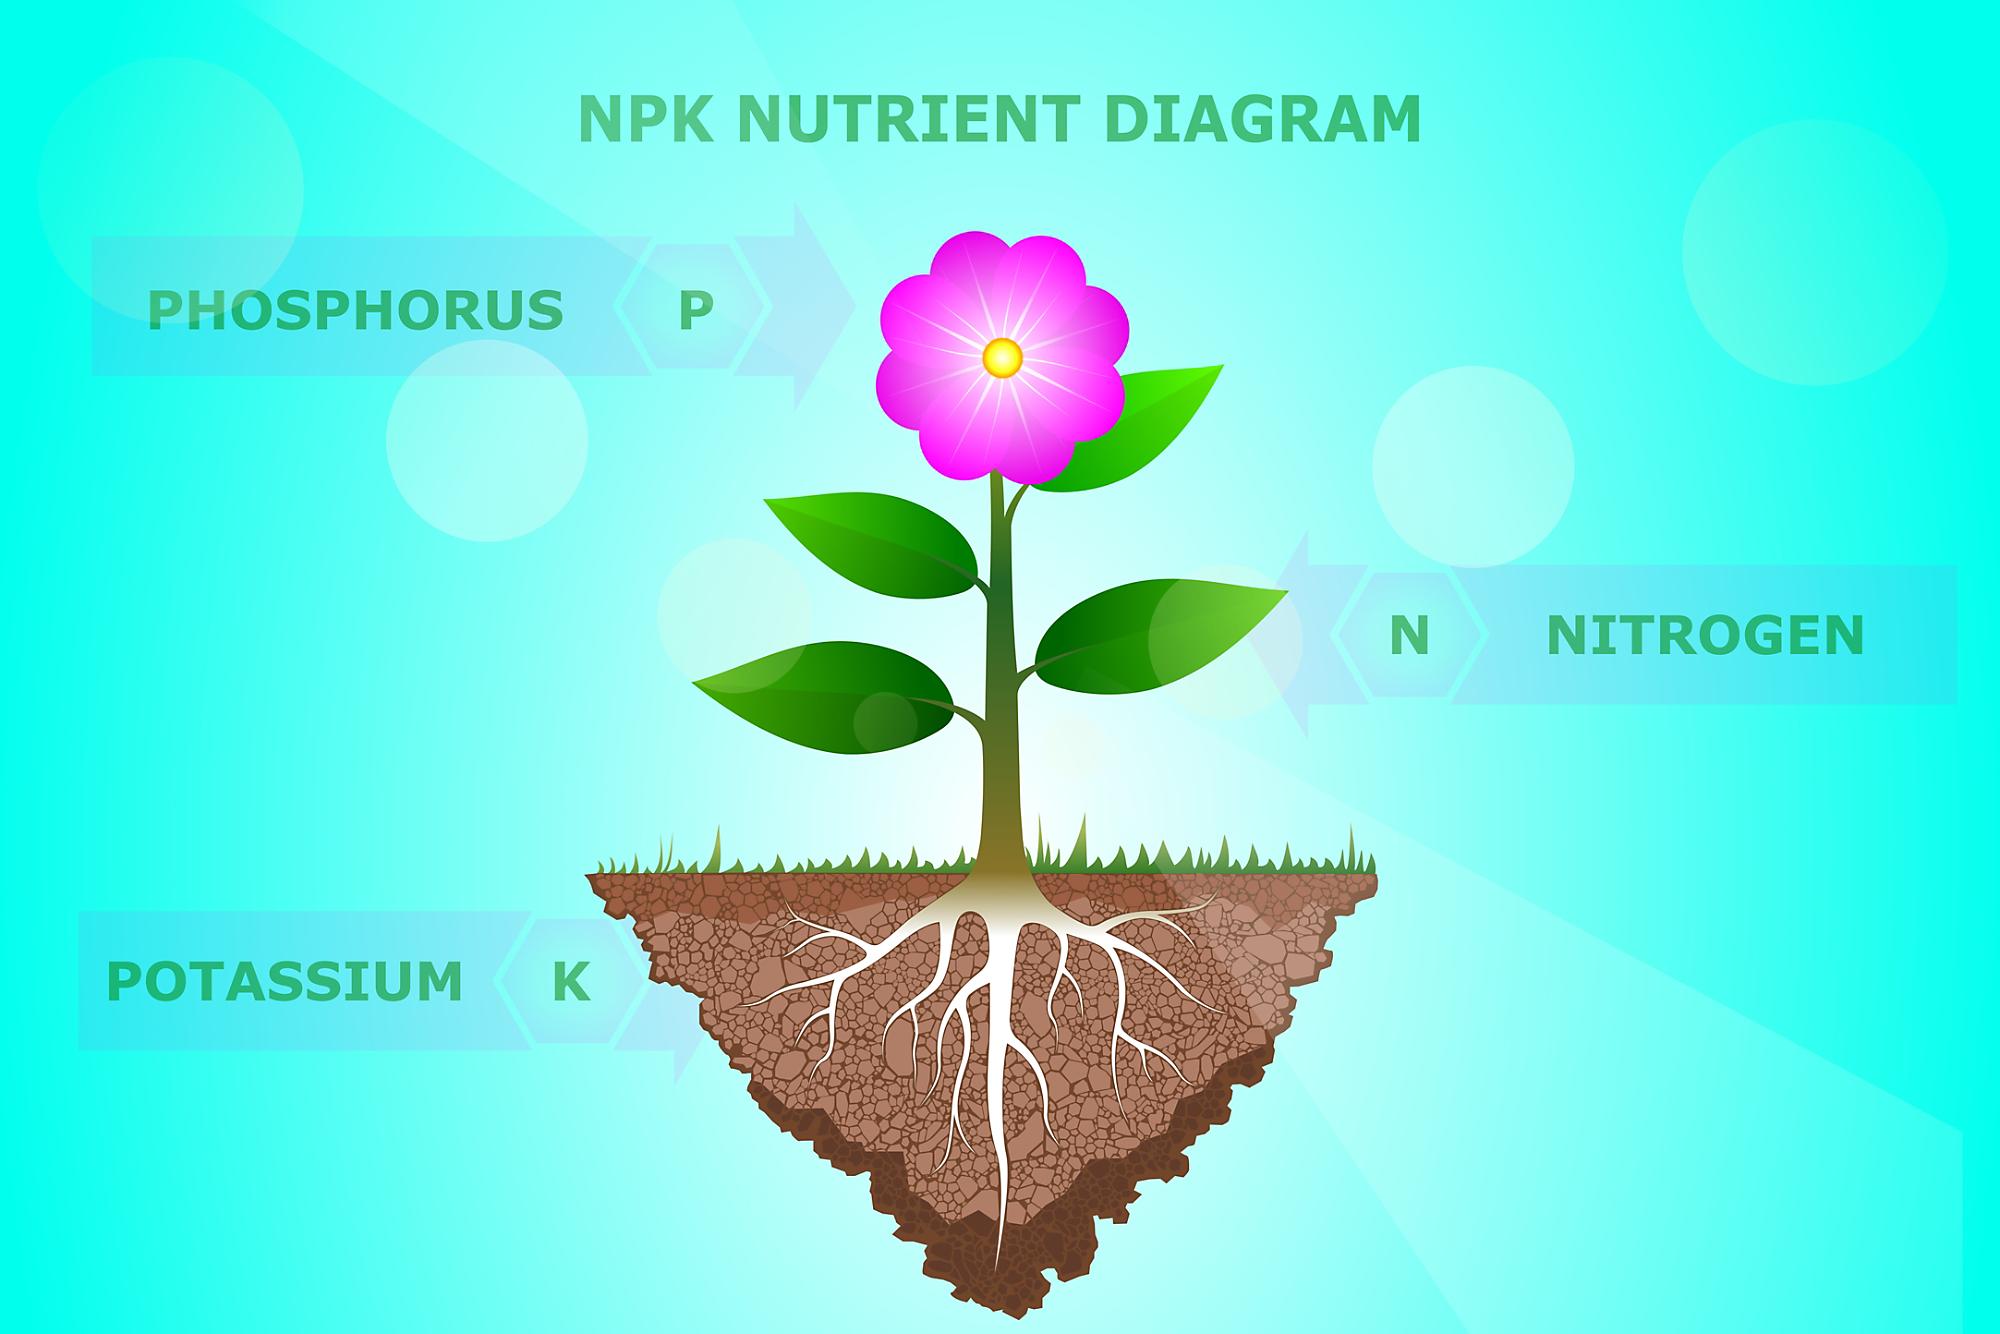 NPK meaning